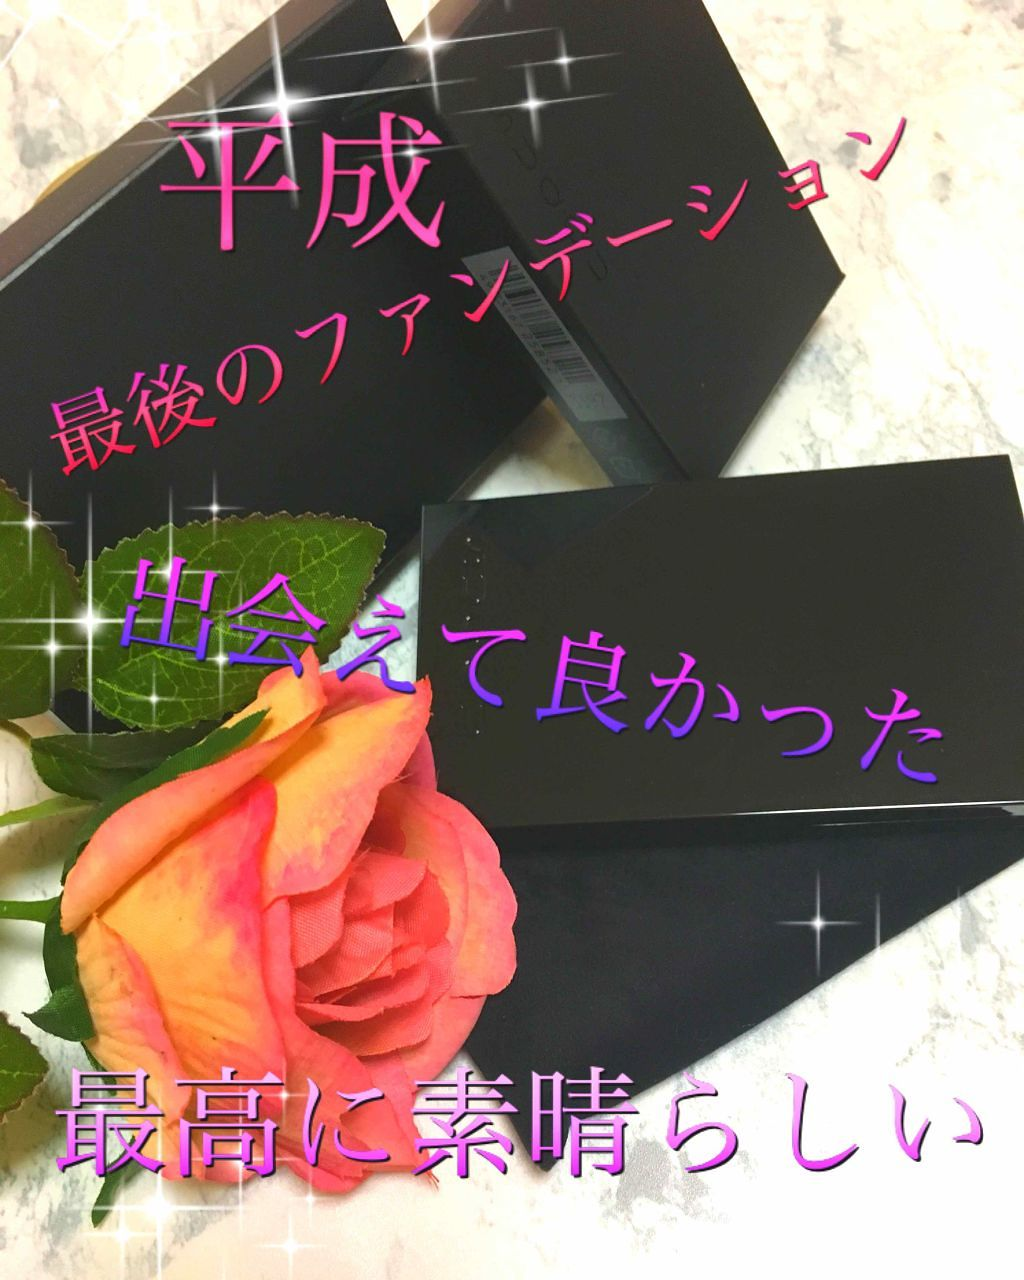 https://cdn.lipscosme.com/image/fbcf1b46a6eb6d949bdfbd2e-1556118987-thumb.png